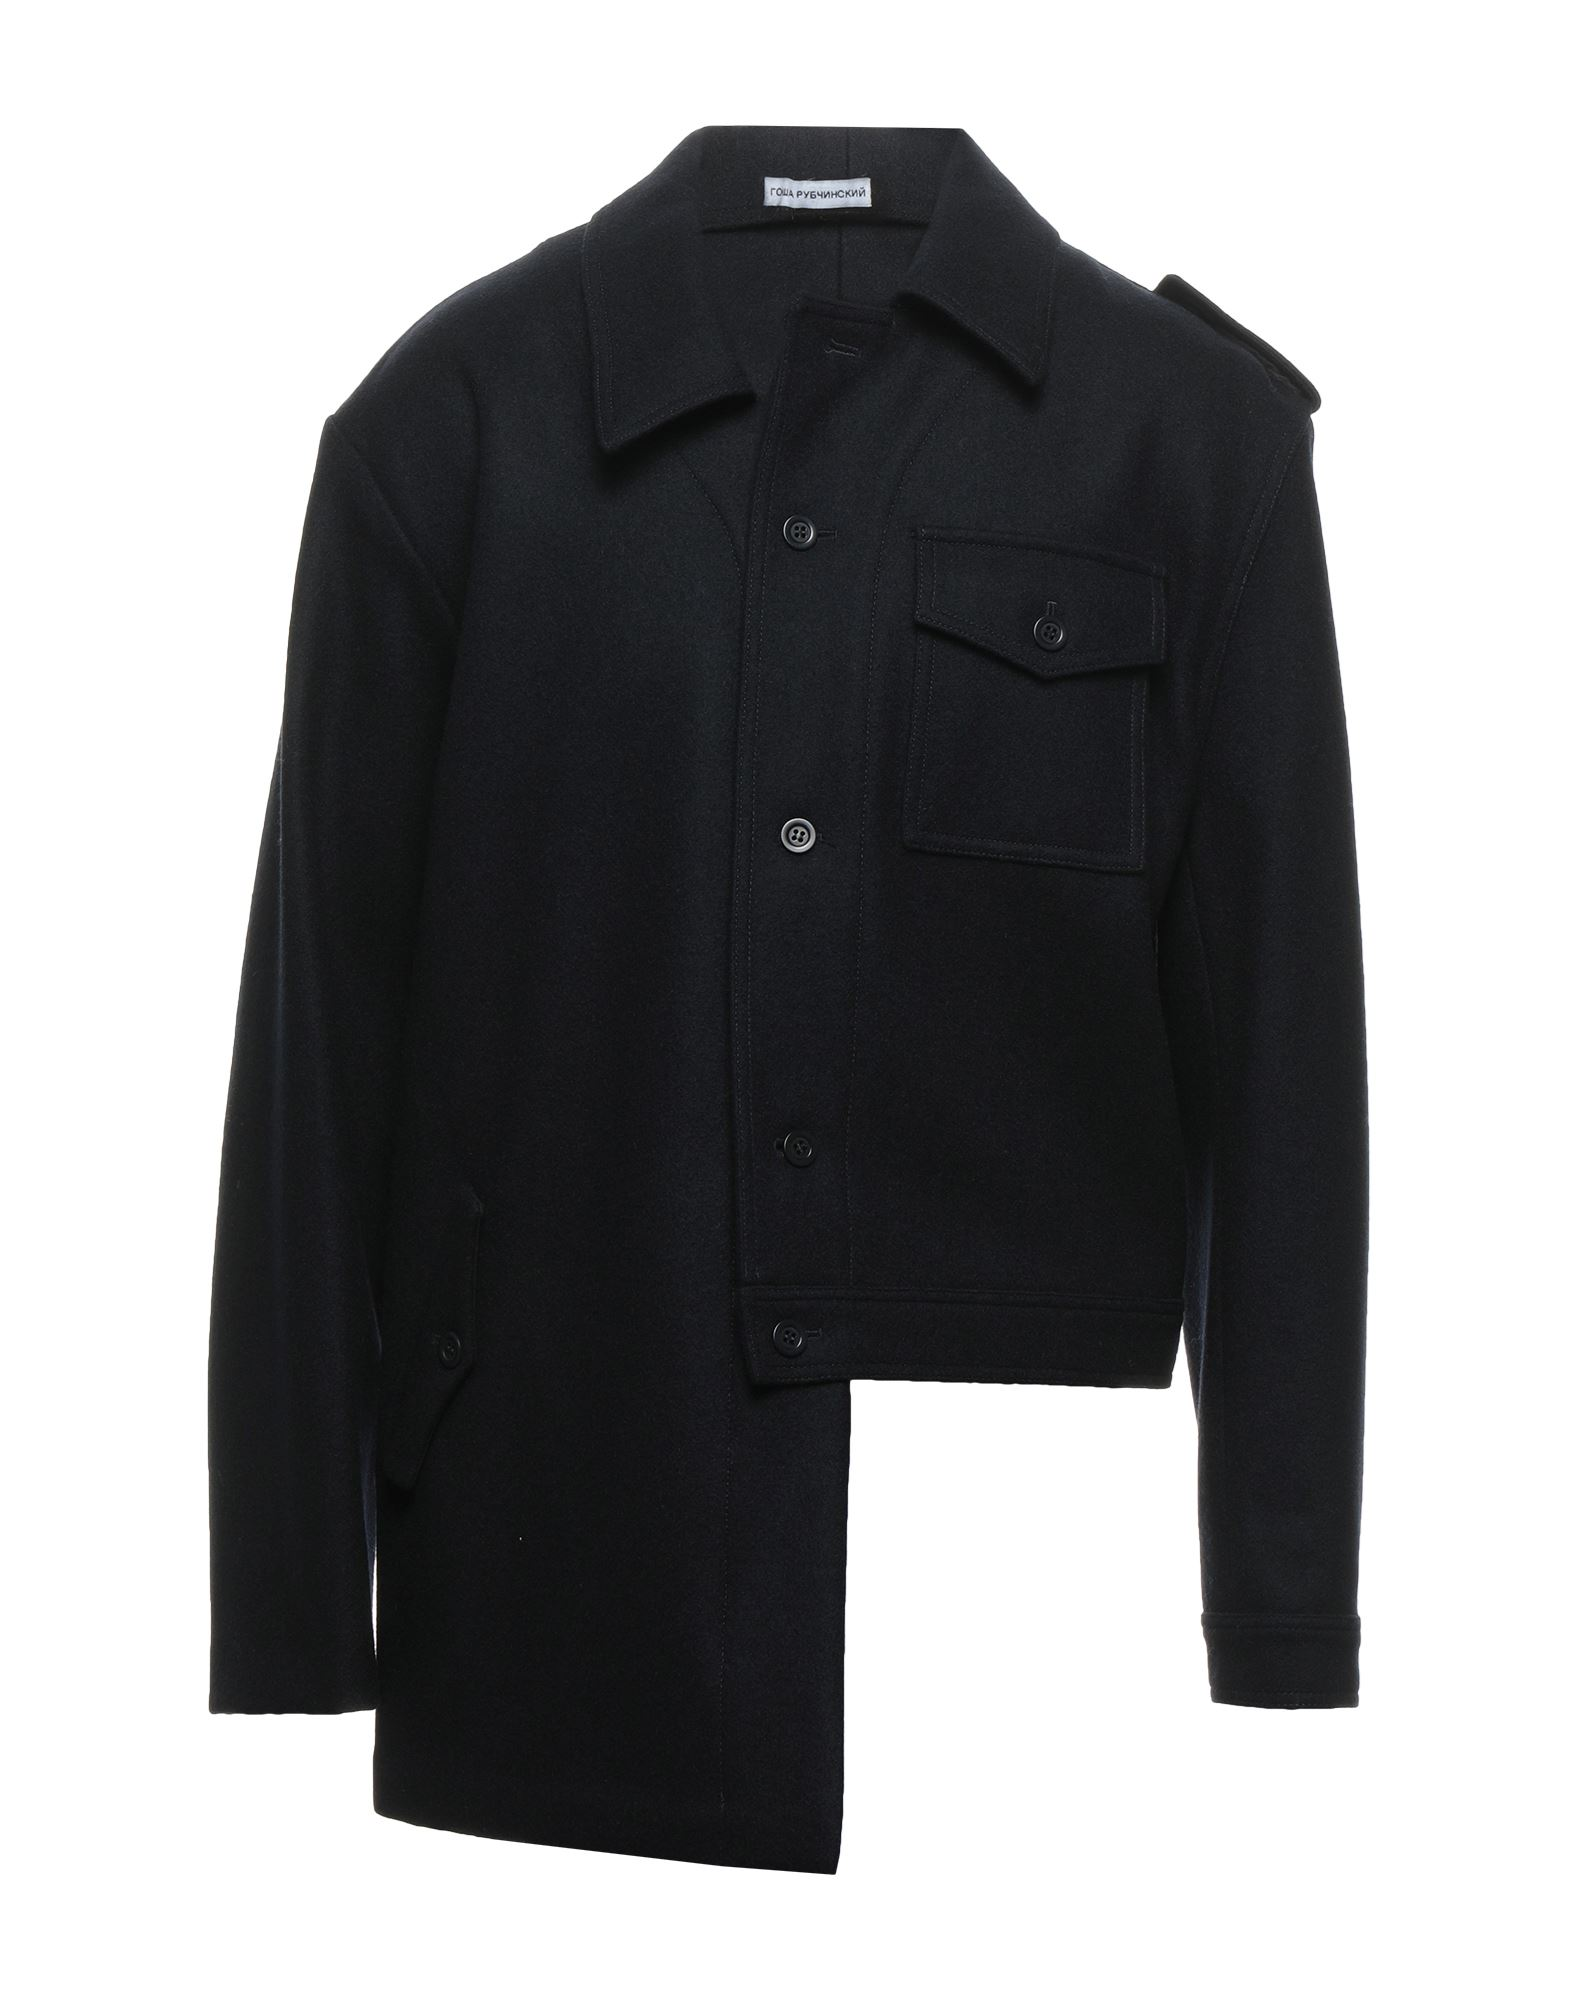 Gosha Rubchinskiy Overcoats In Dark Blue